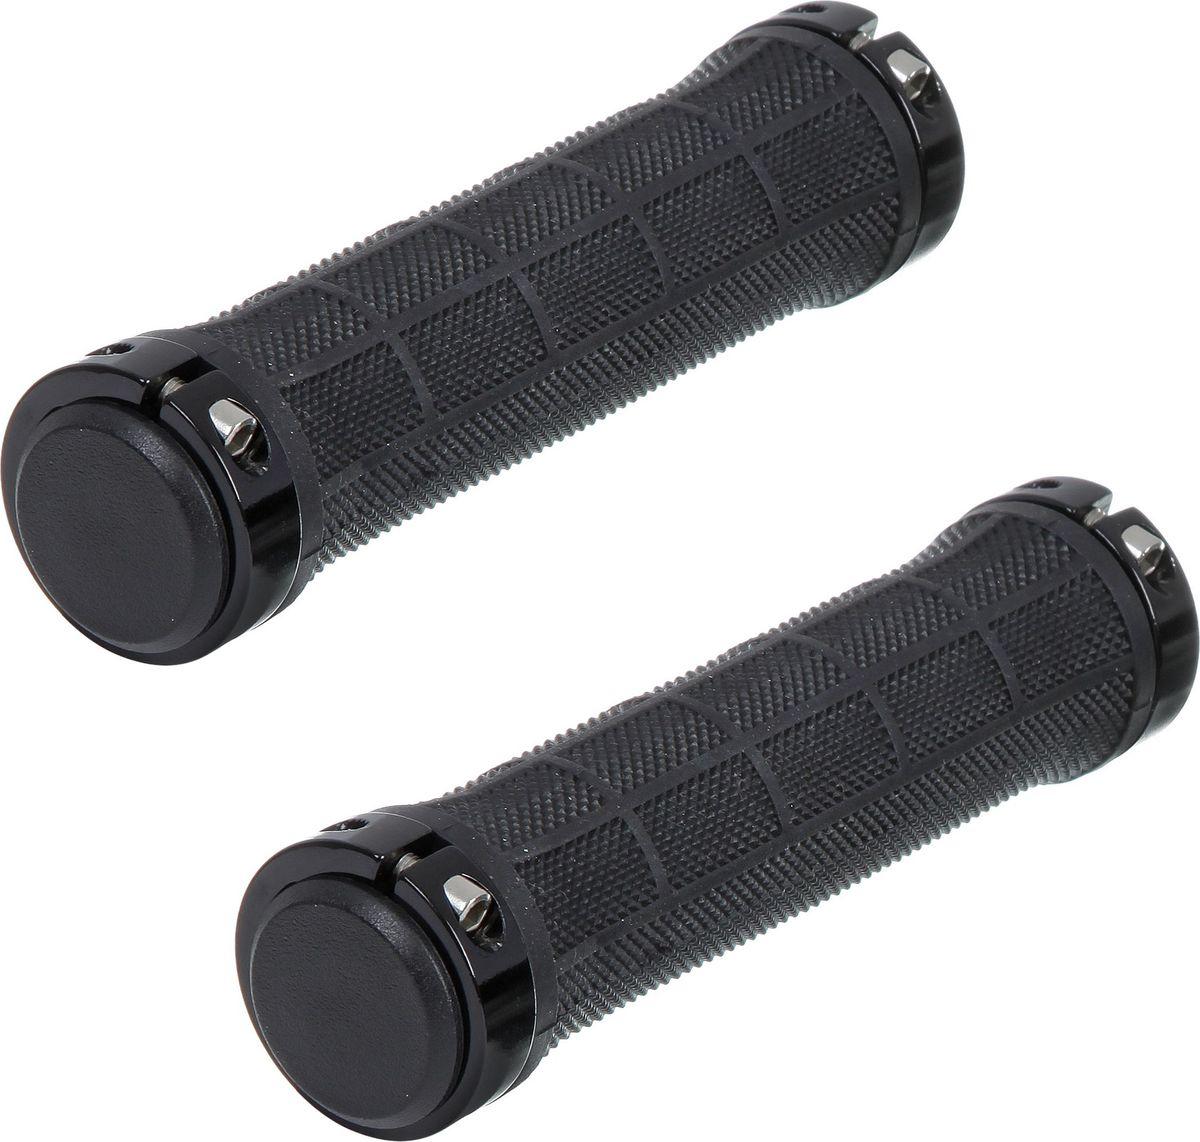 Грипсы STG HL-G309, длина 13 см, 2 шт фонарь на ниппель stg jy 503c 11 2 шт х54095